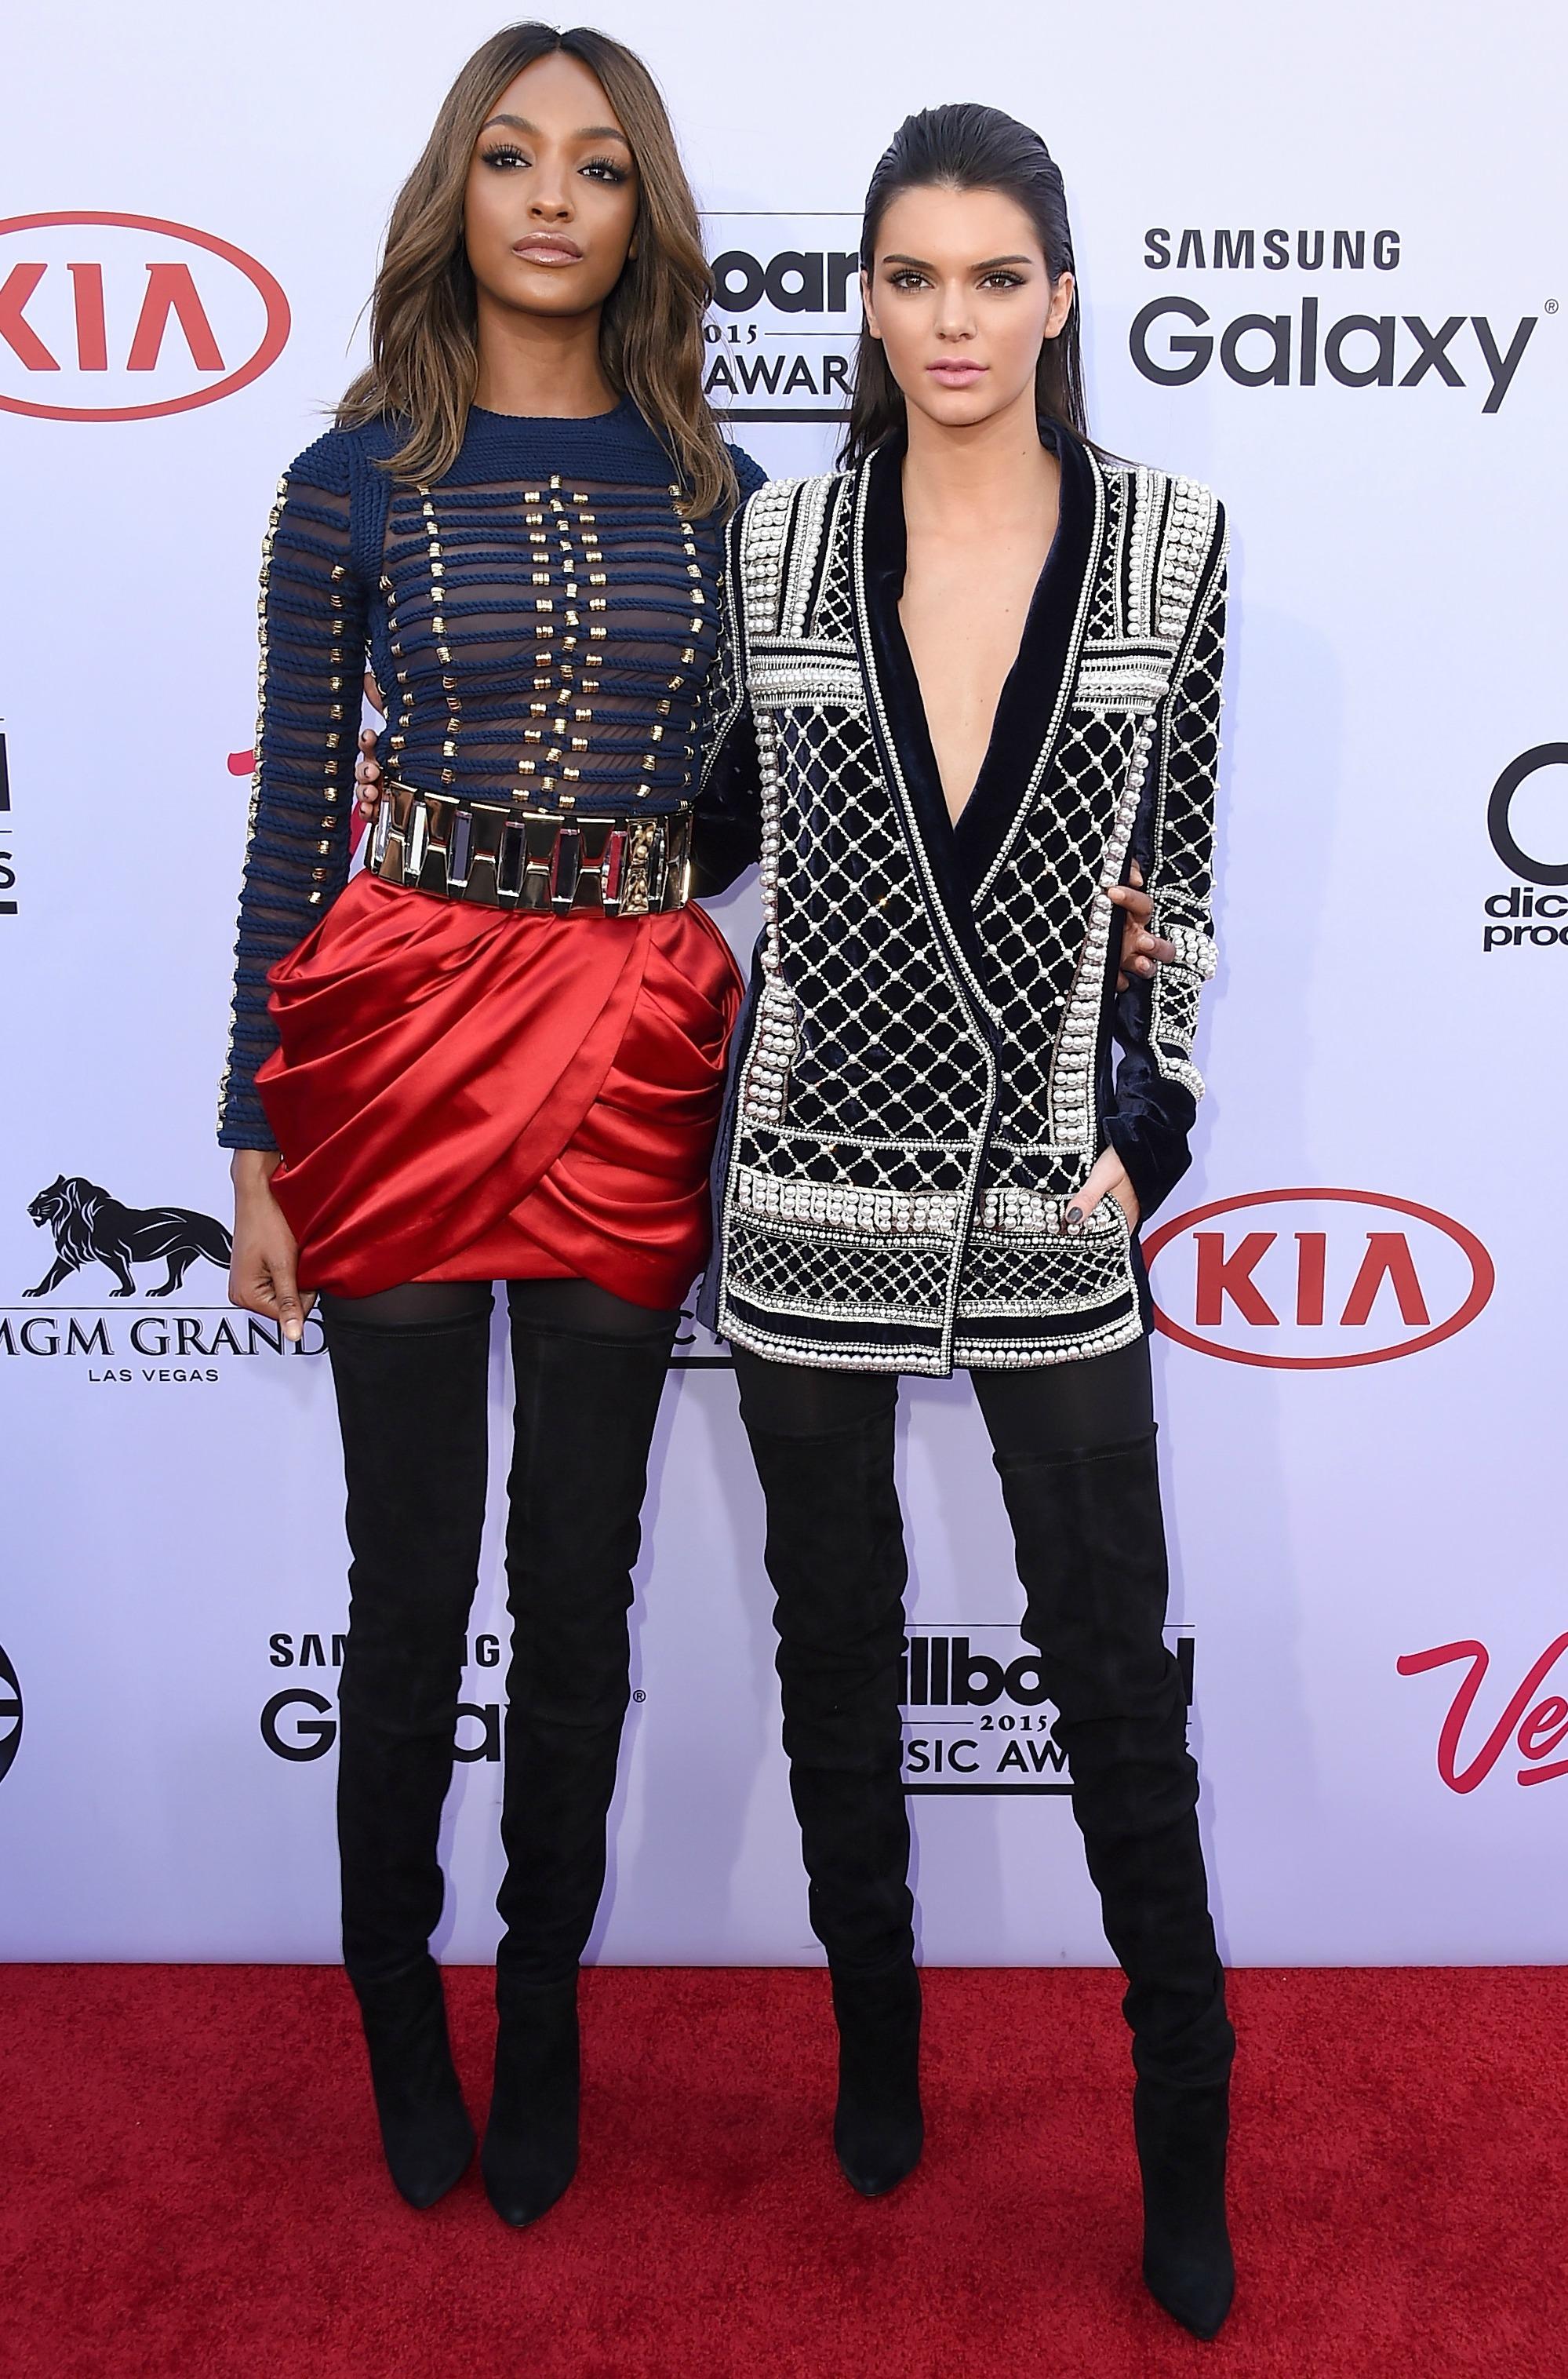 Kendall Jenner and Jourdan Dunn at Billboard Music Awards